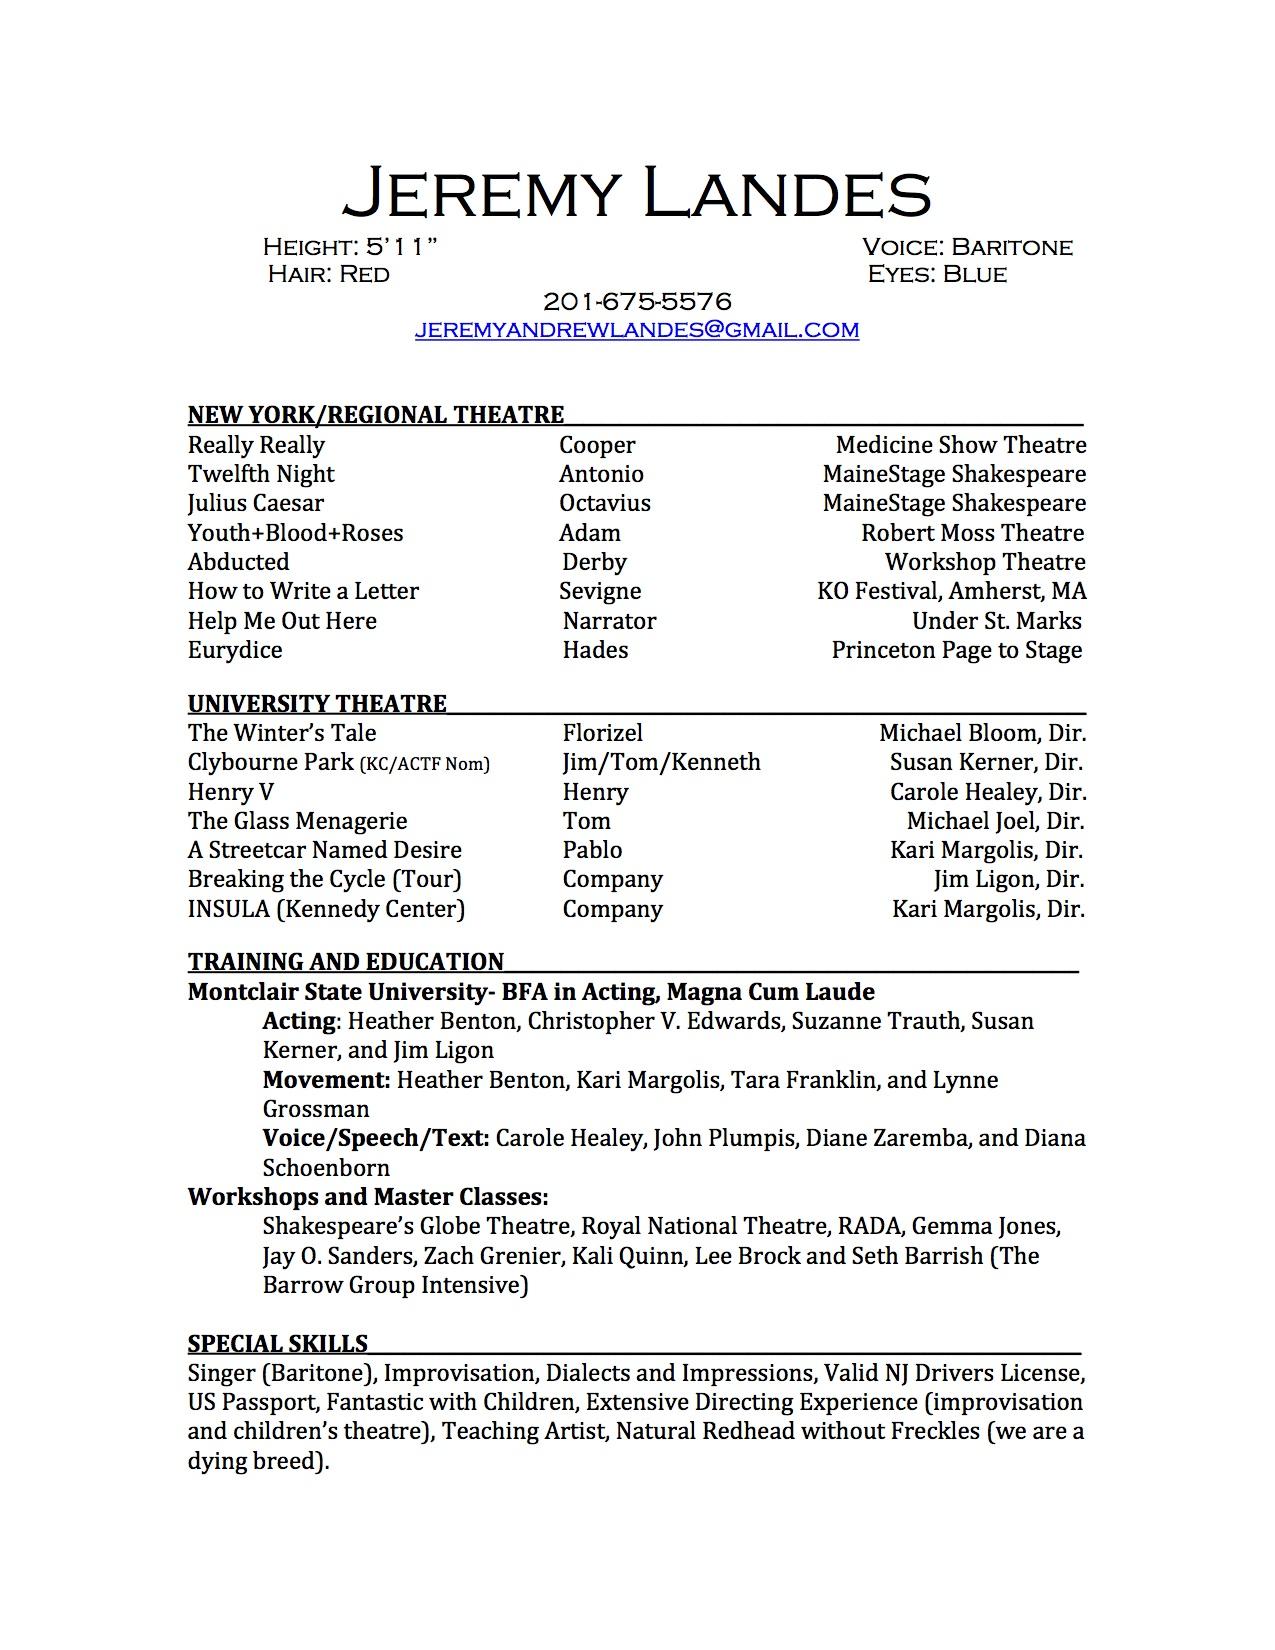 Performance Resume — Jeremy Landes